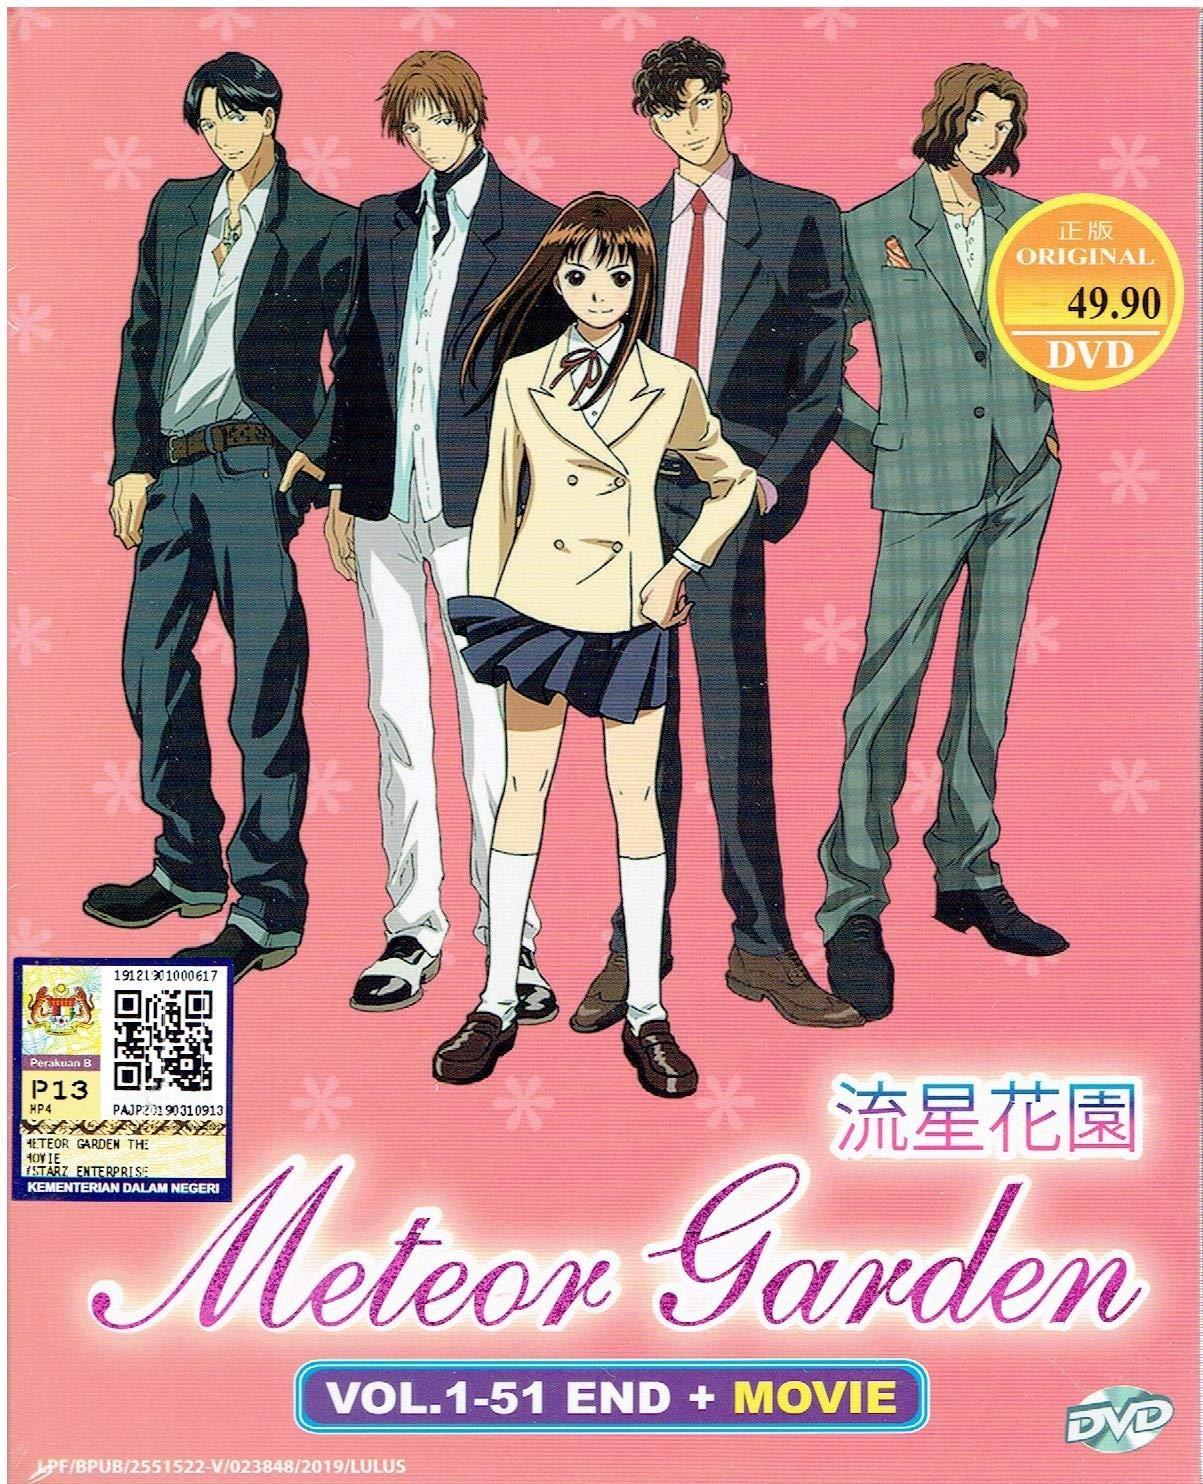 METEOR GARDEN - COMPLETE ANIME TV SERIES DVD BOX SET (51 EPISODES + MOVIE)